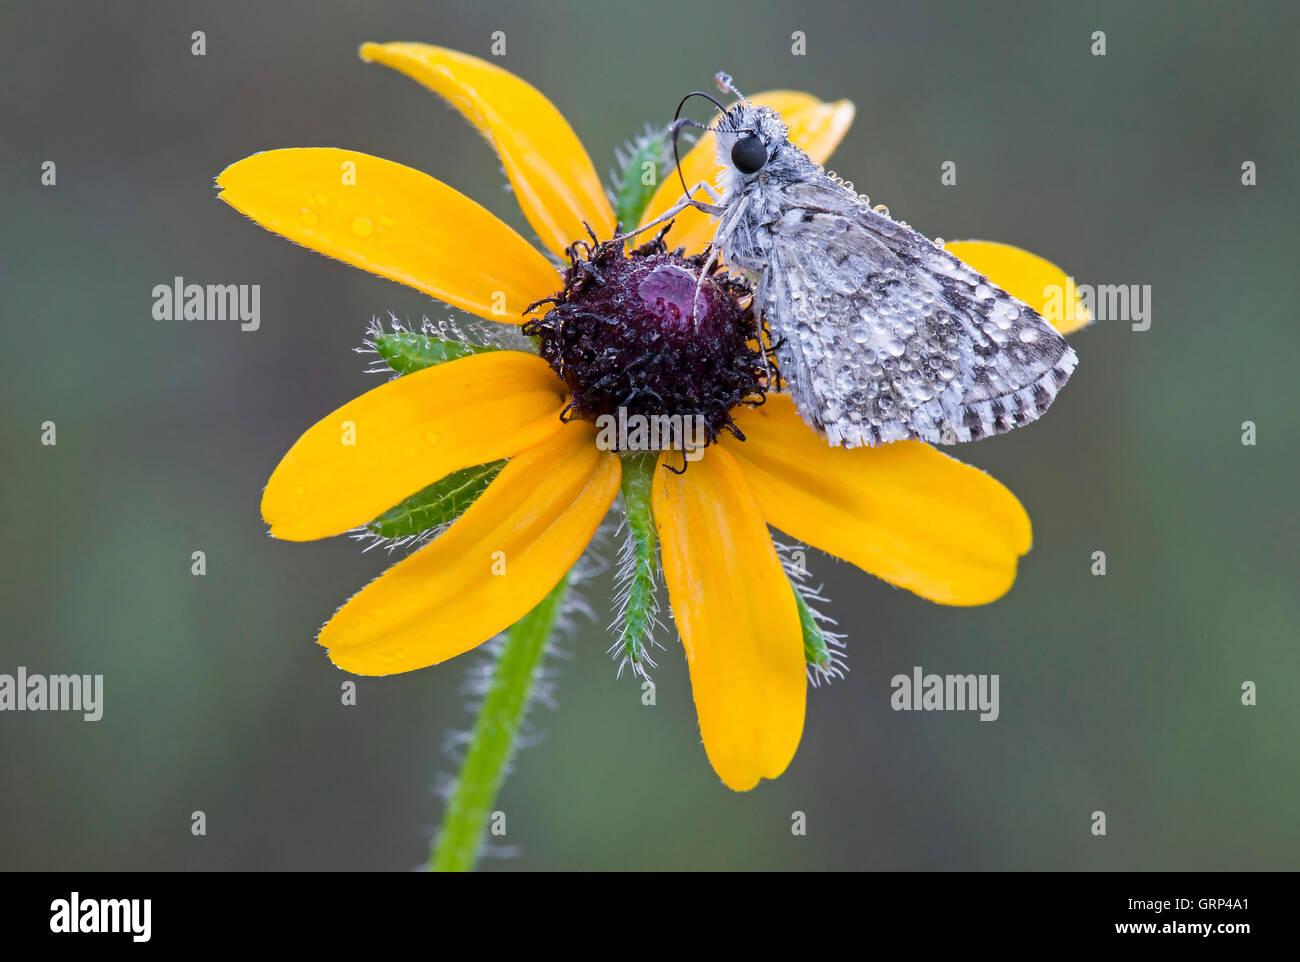 Rugiadoso comune Skipper a scacchi Butterfly (Pyrgus communis) nectaring, alimentando il black-eyed Susan (Rudbeckia Foto Stock